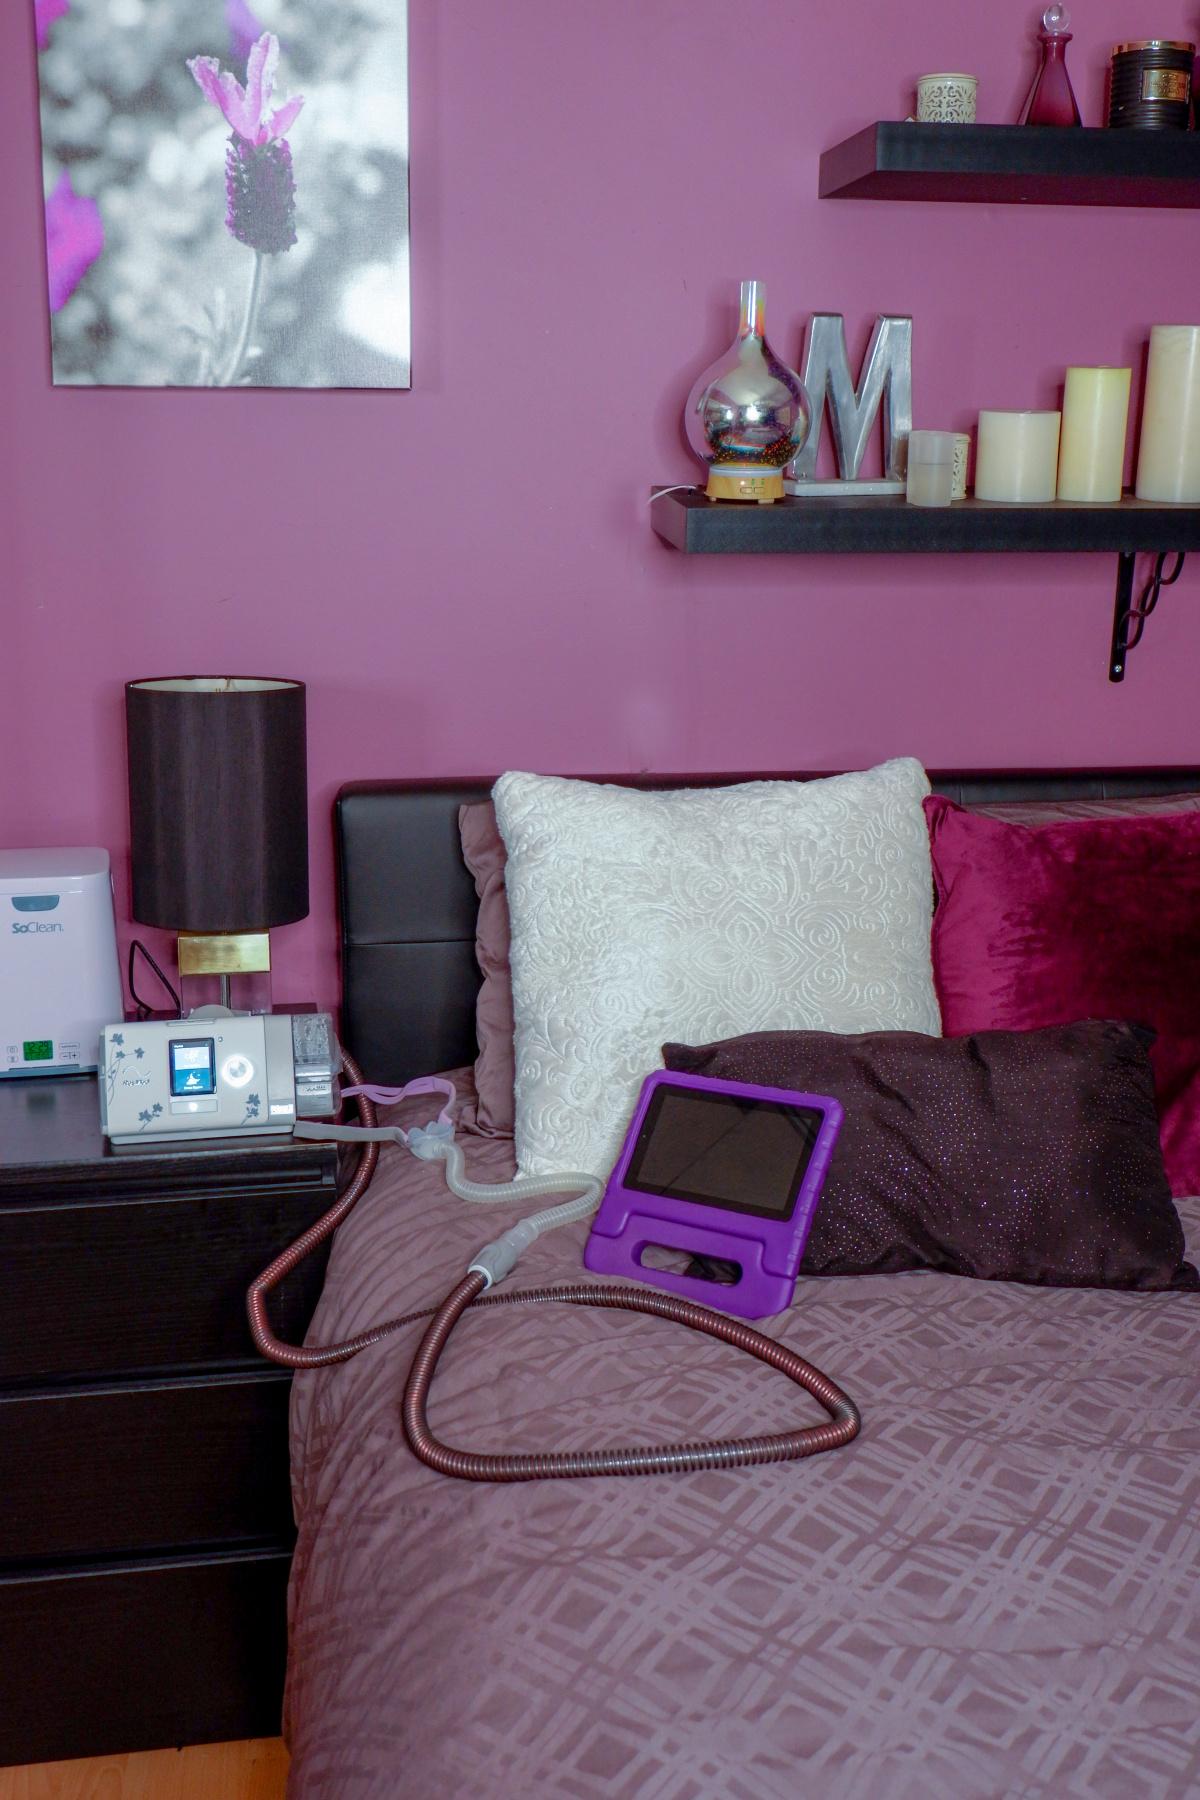 snoring solution, sleep apnea, cpap machine, snoring